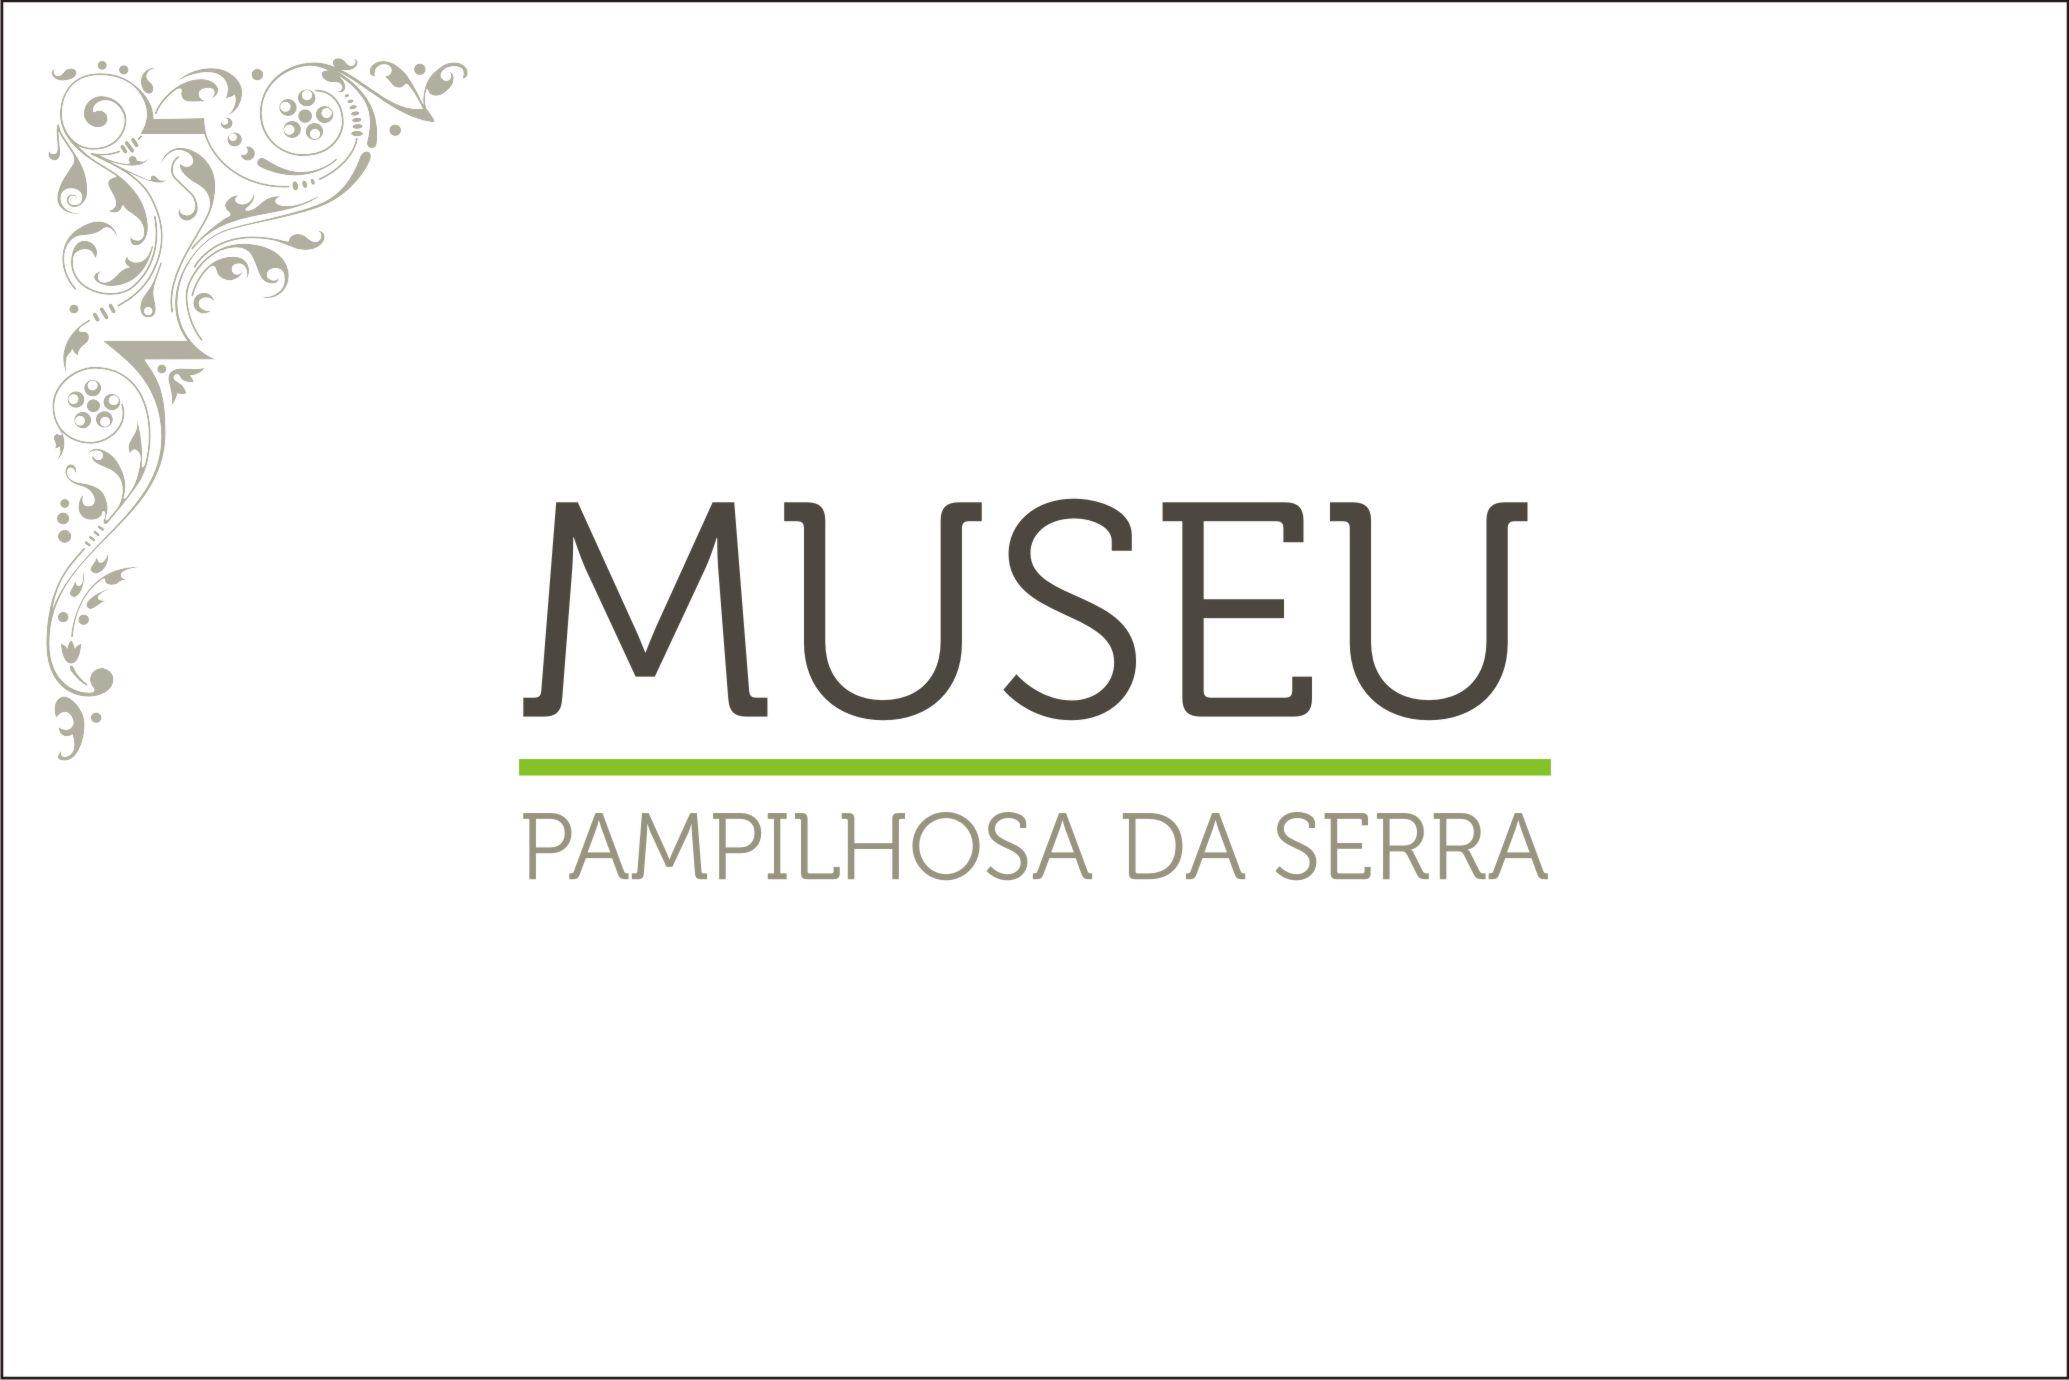 postais museu CURVAS finais 8